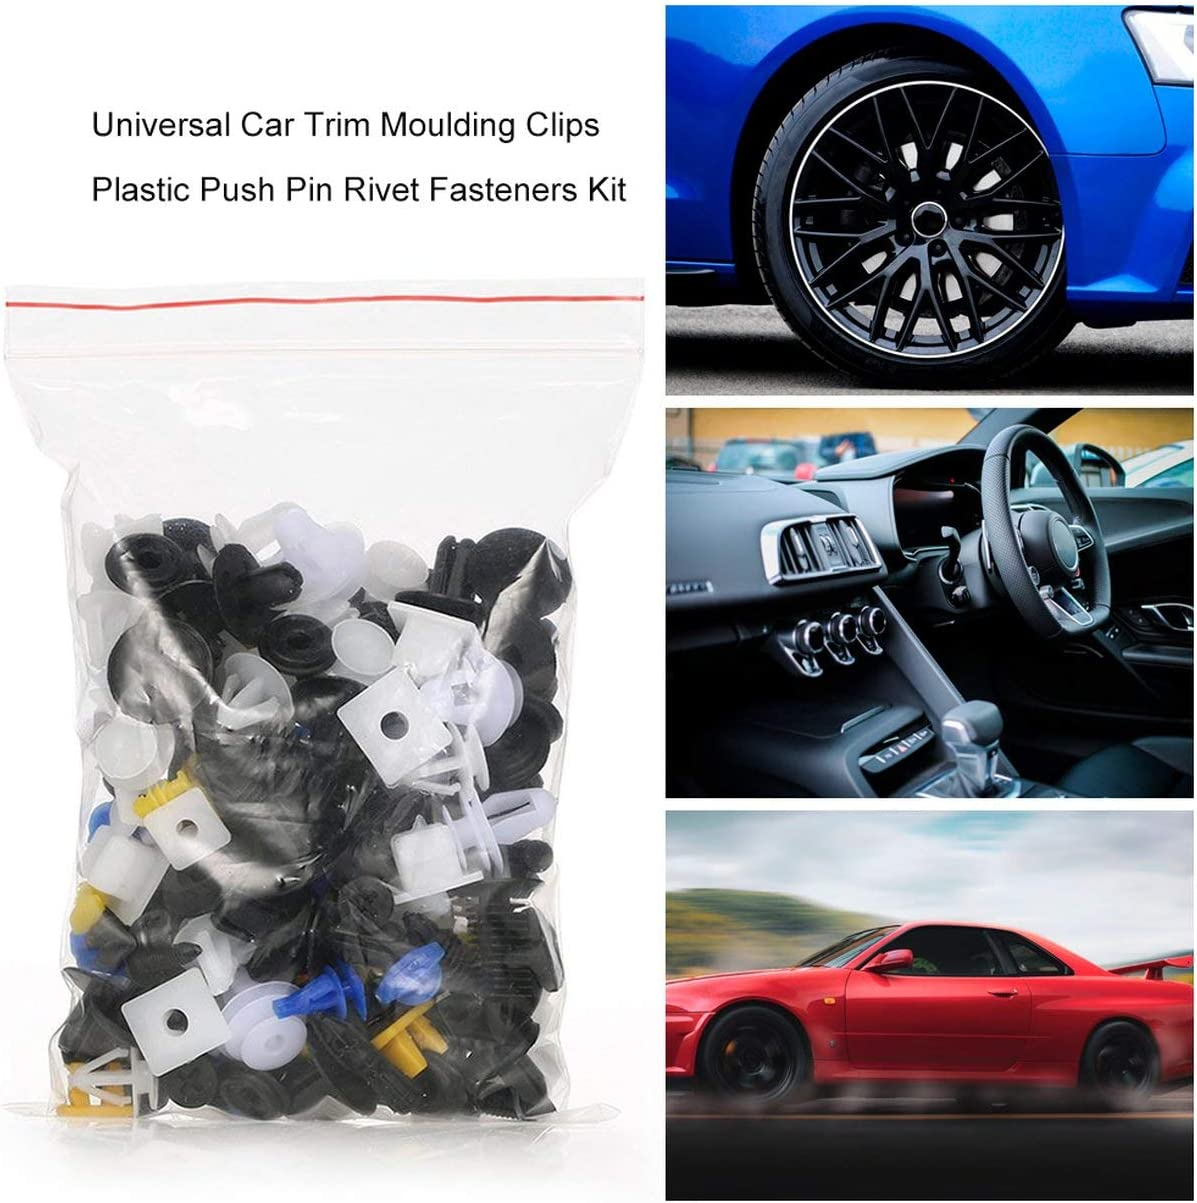 Universal-Auto Body Trim Moulding Clips aus Kunststoff Push-Retainer Pin Rivet Fasteners Plattenhalter Clips Sortiment Kit Farbe: Mischungsfarbe-400pcs